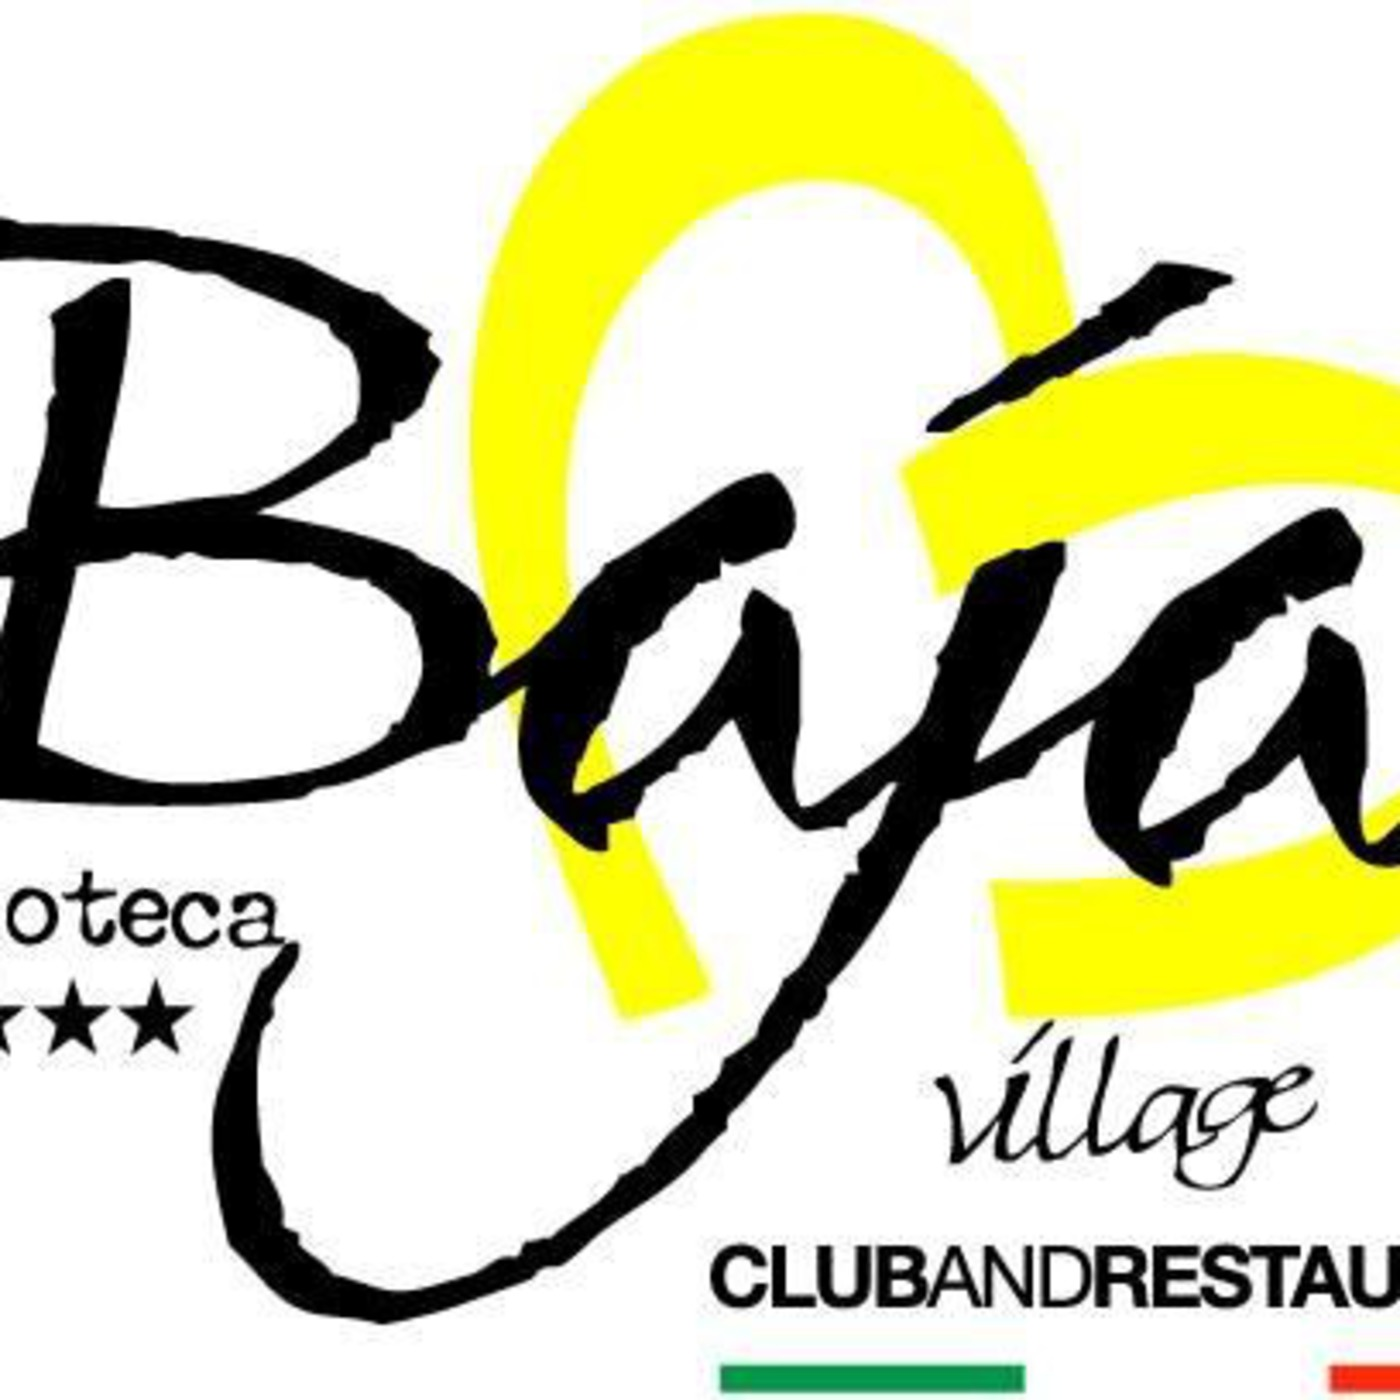 Baja Village 2013